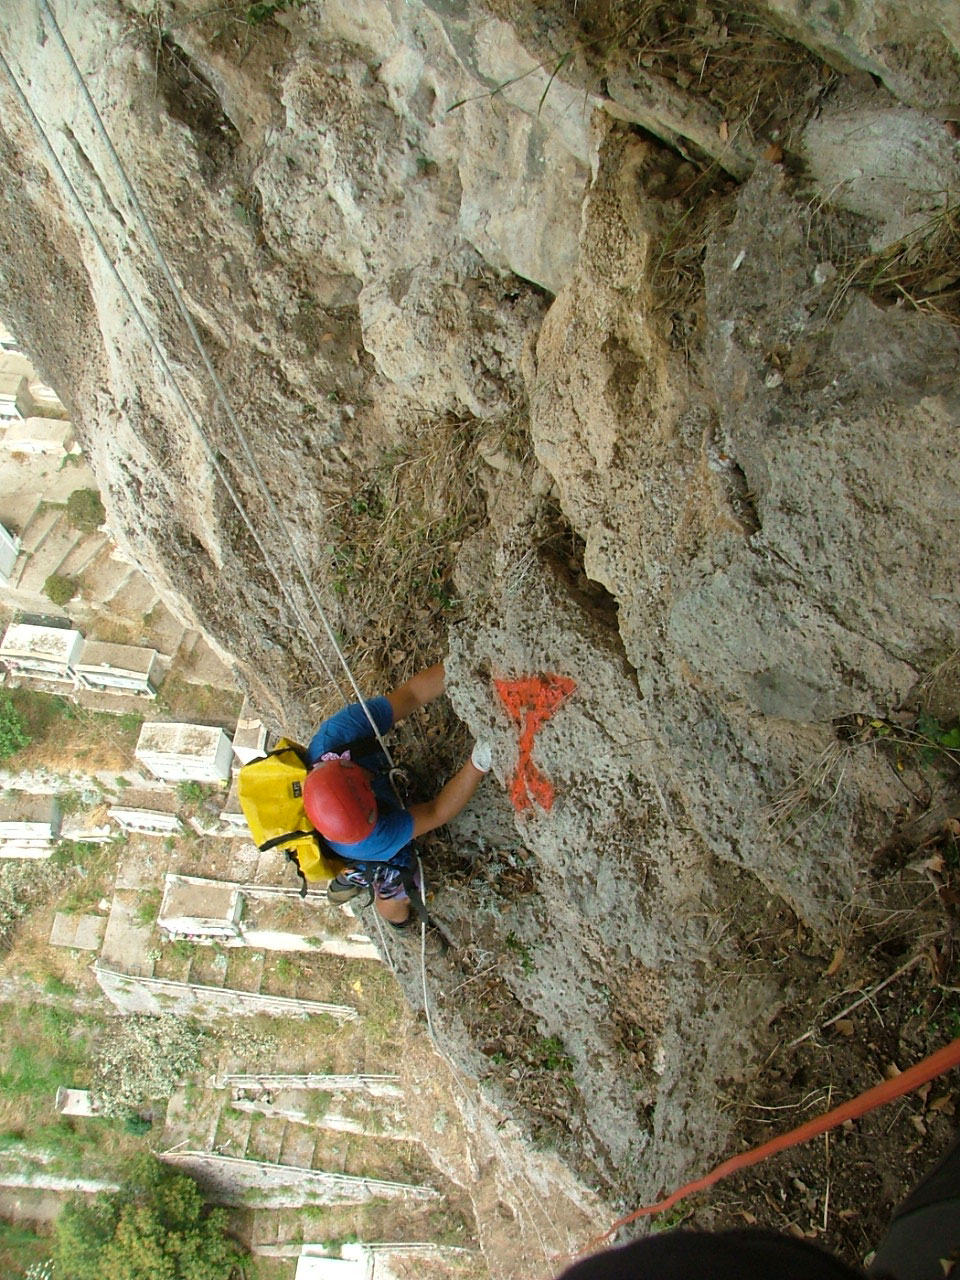 http://www.geoinformatica.it/wp-content/uploads/2015/07/direzione-lavori11.jpg